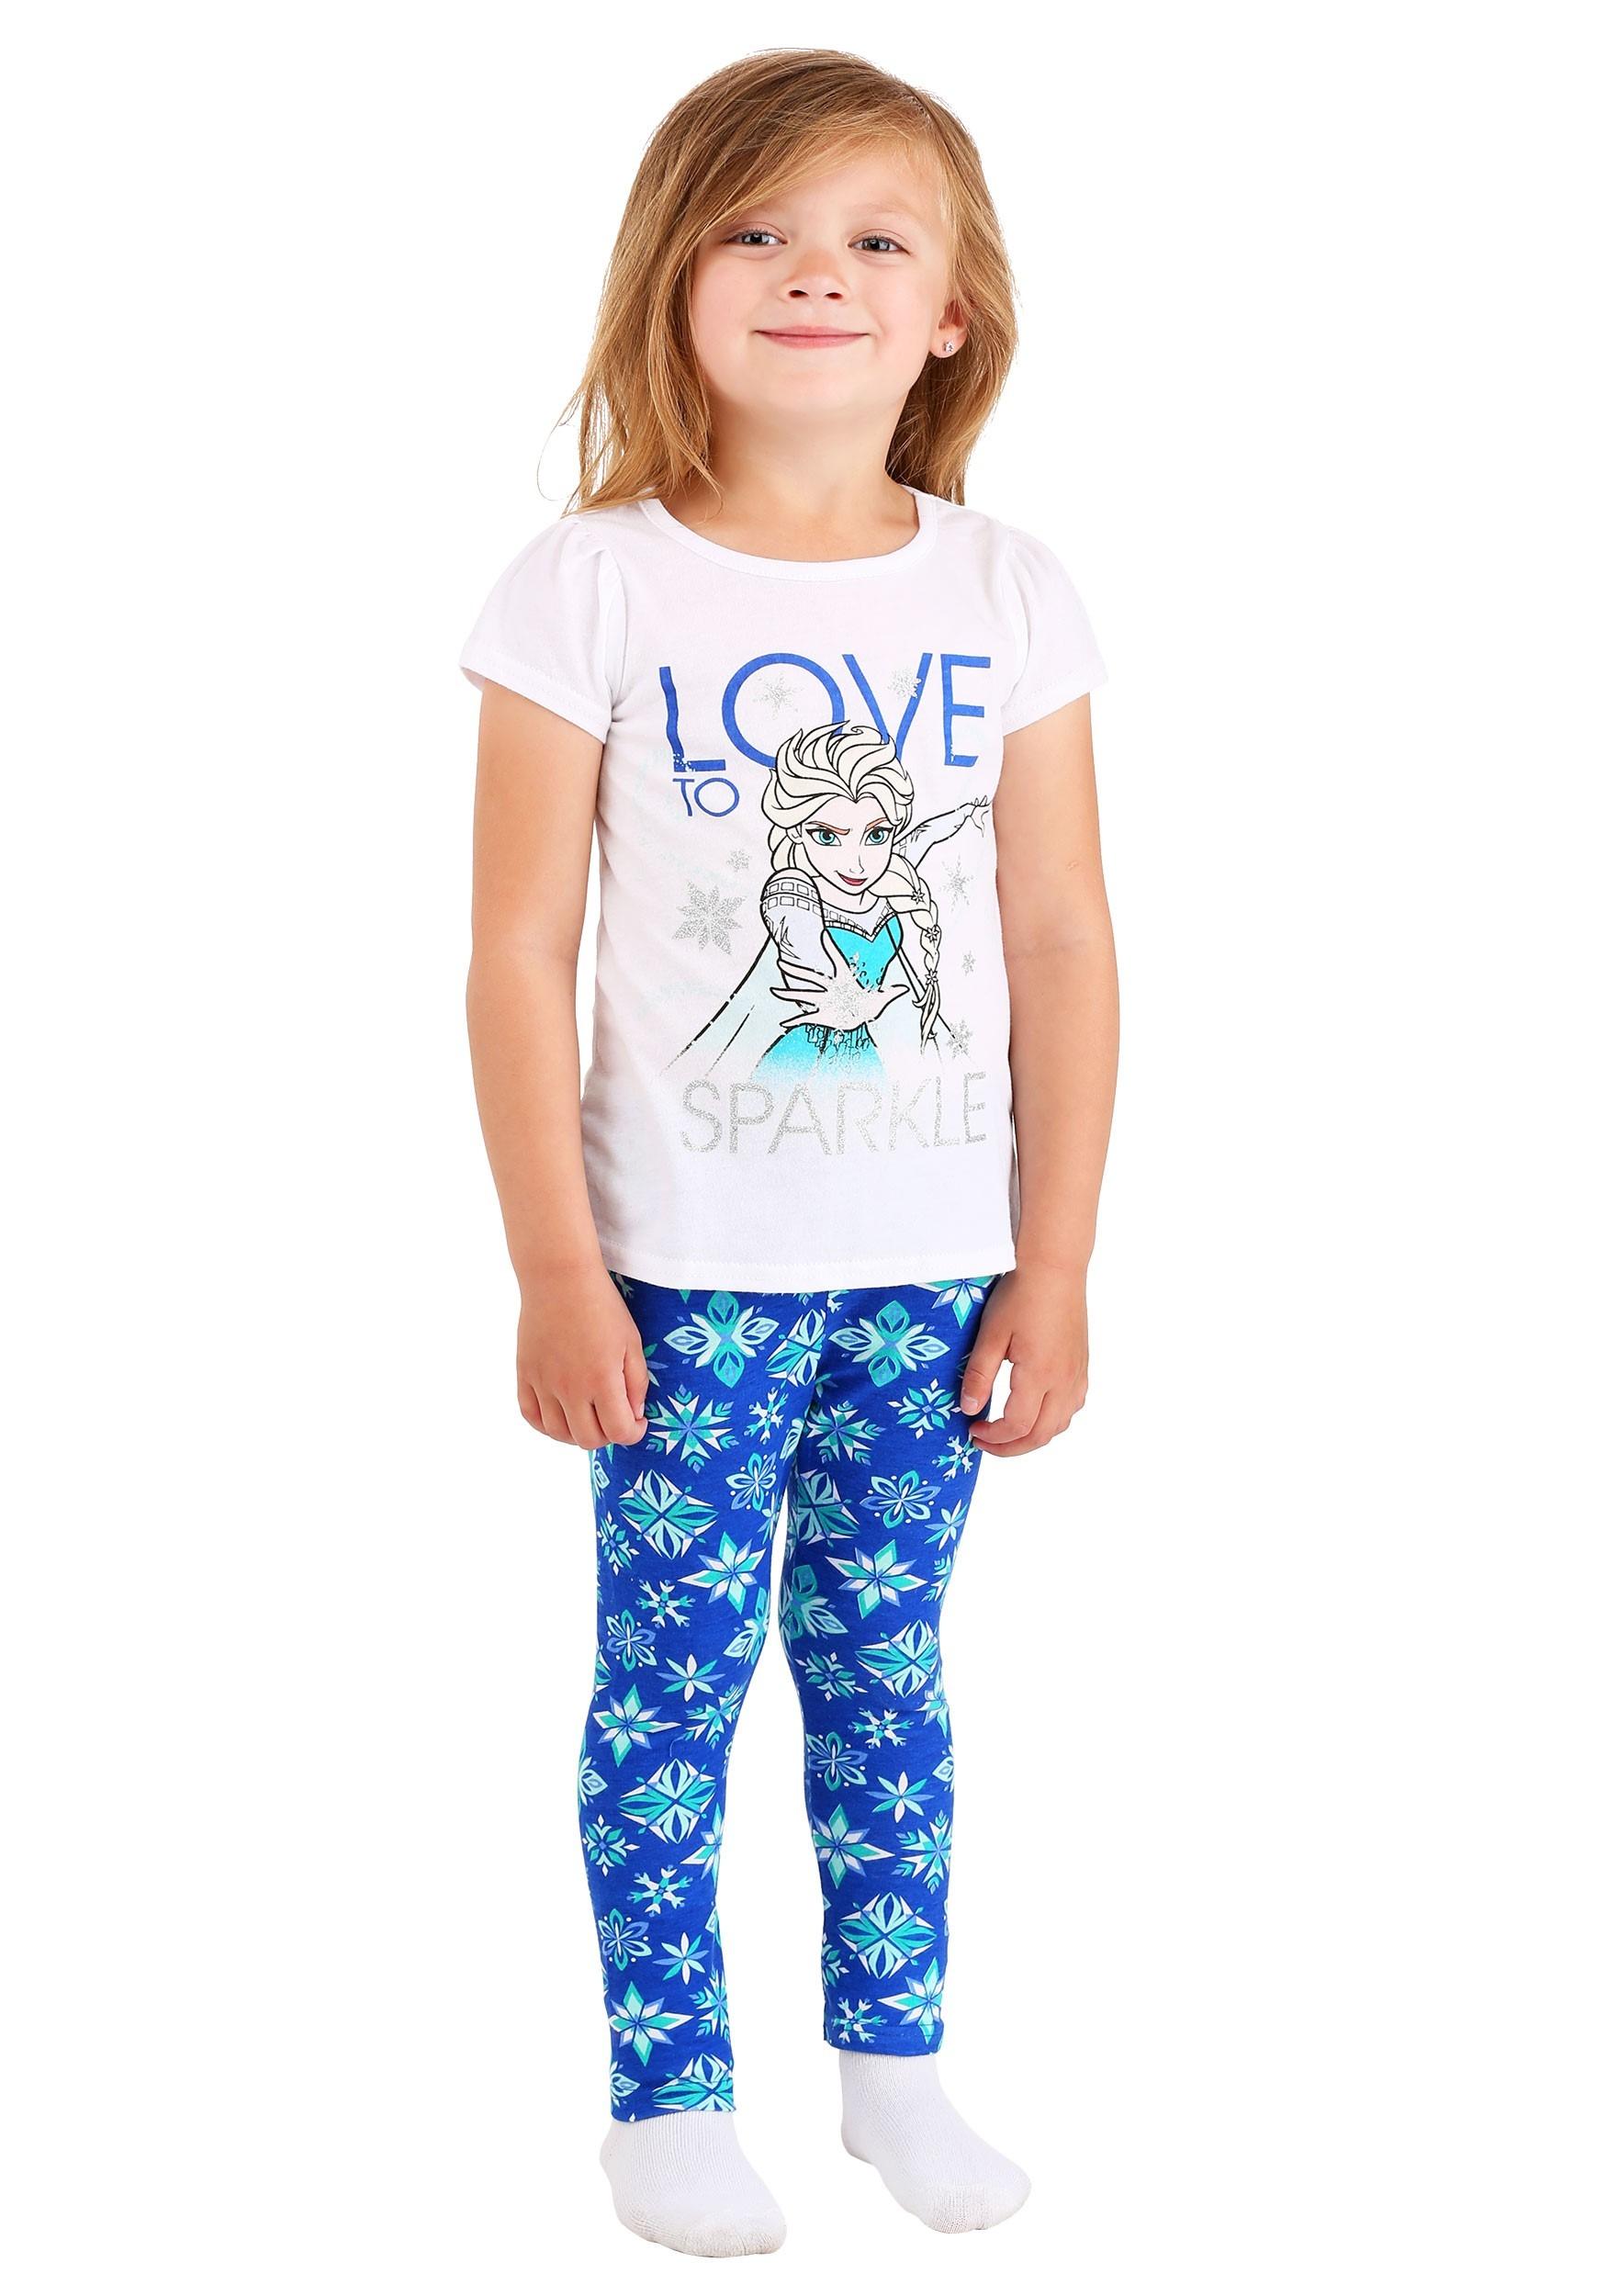 Toddler Frozen Love to Sparkle Girls 2pc Set